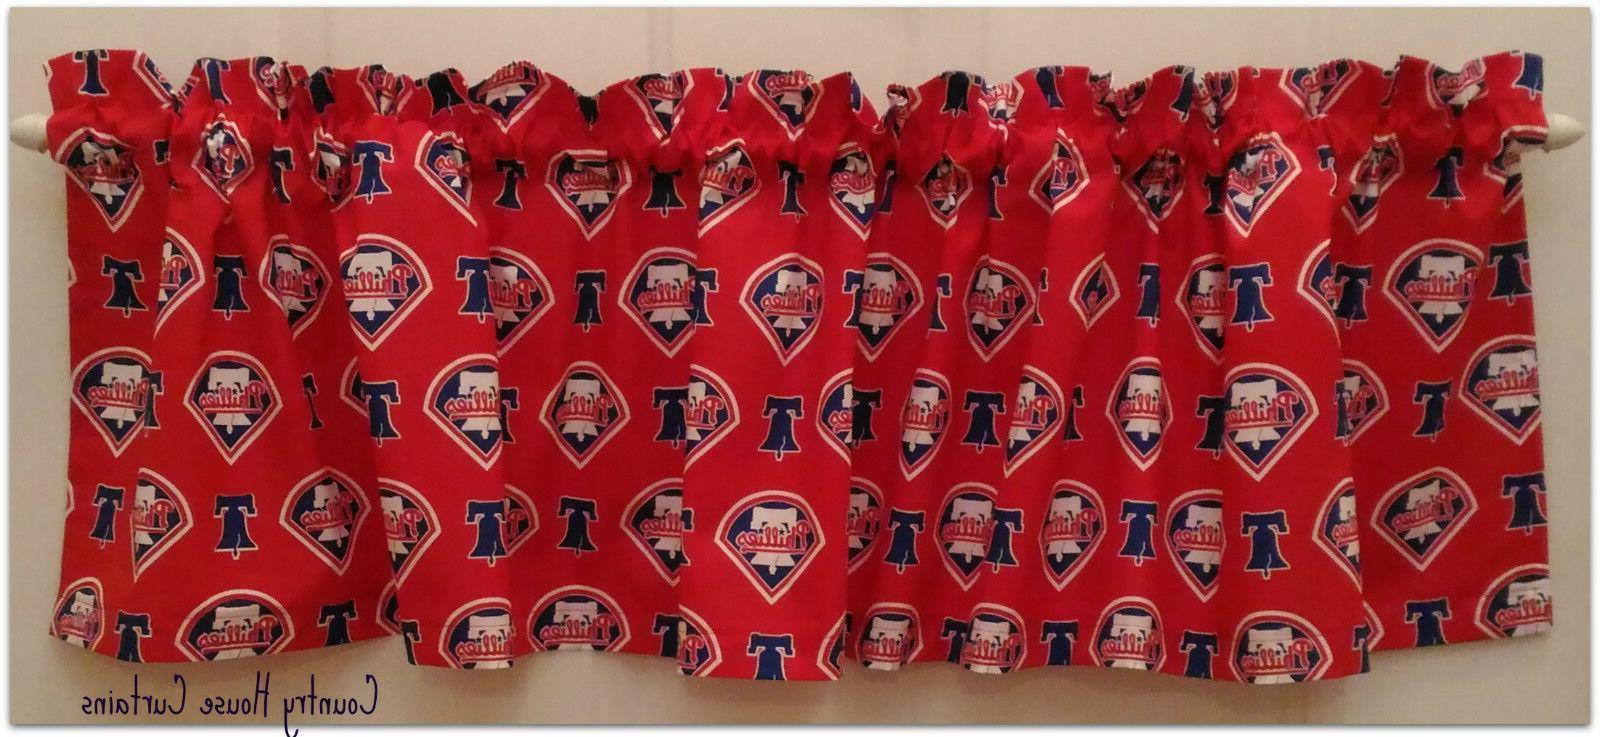 mlb baseball philadelphia phillies window curtain valance